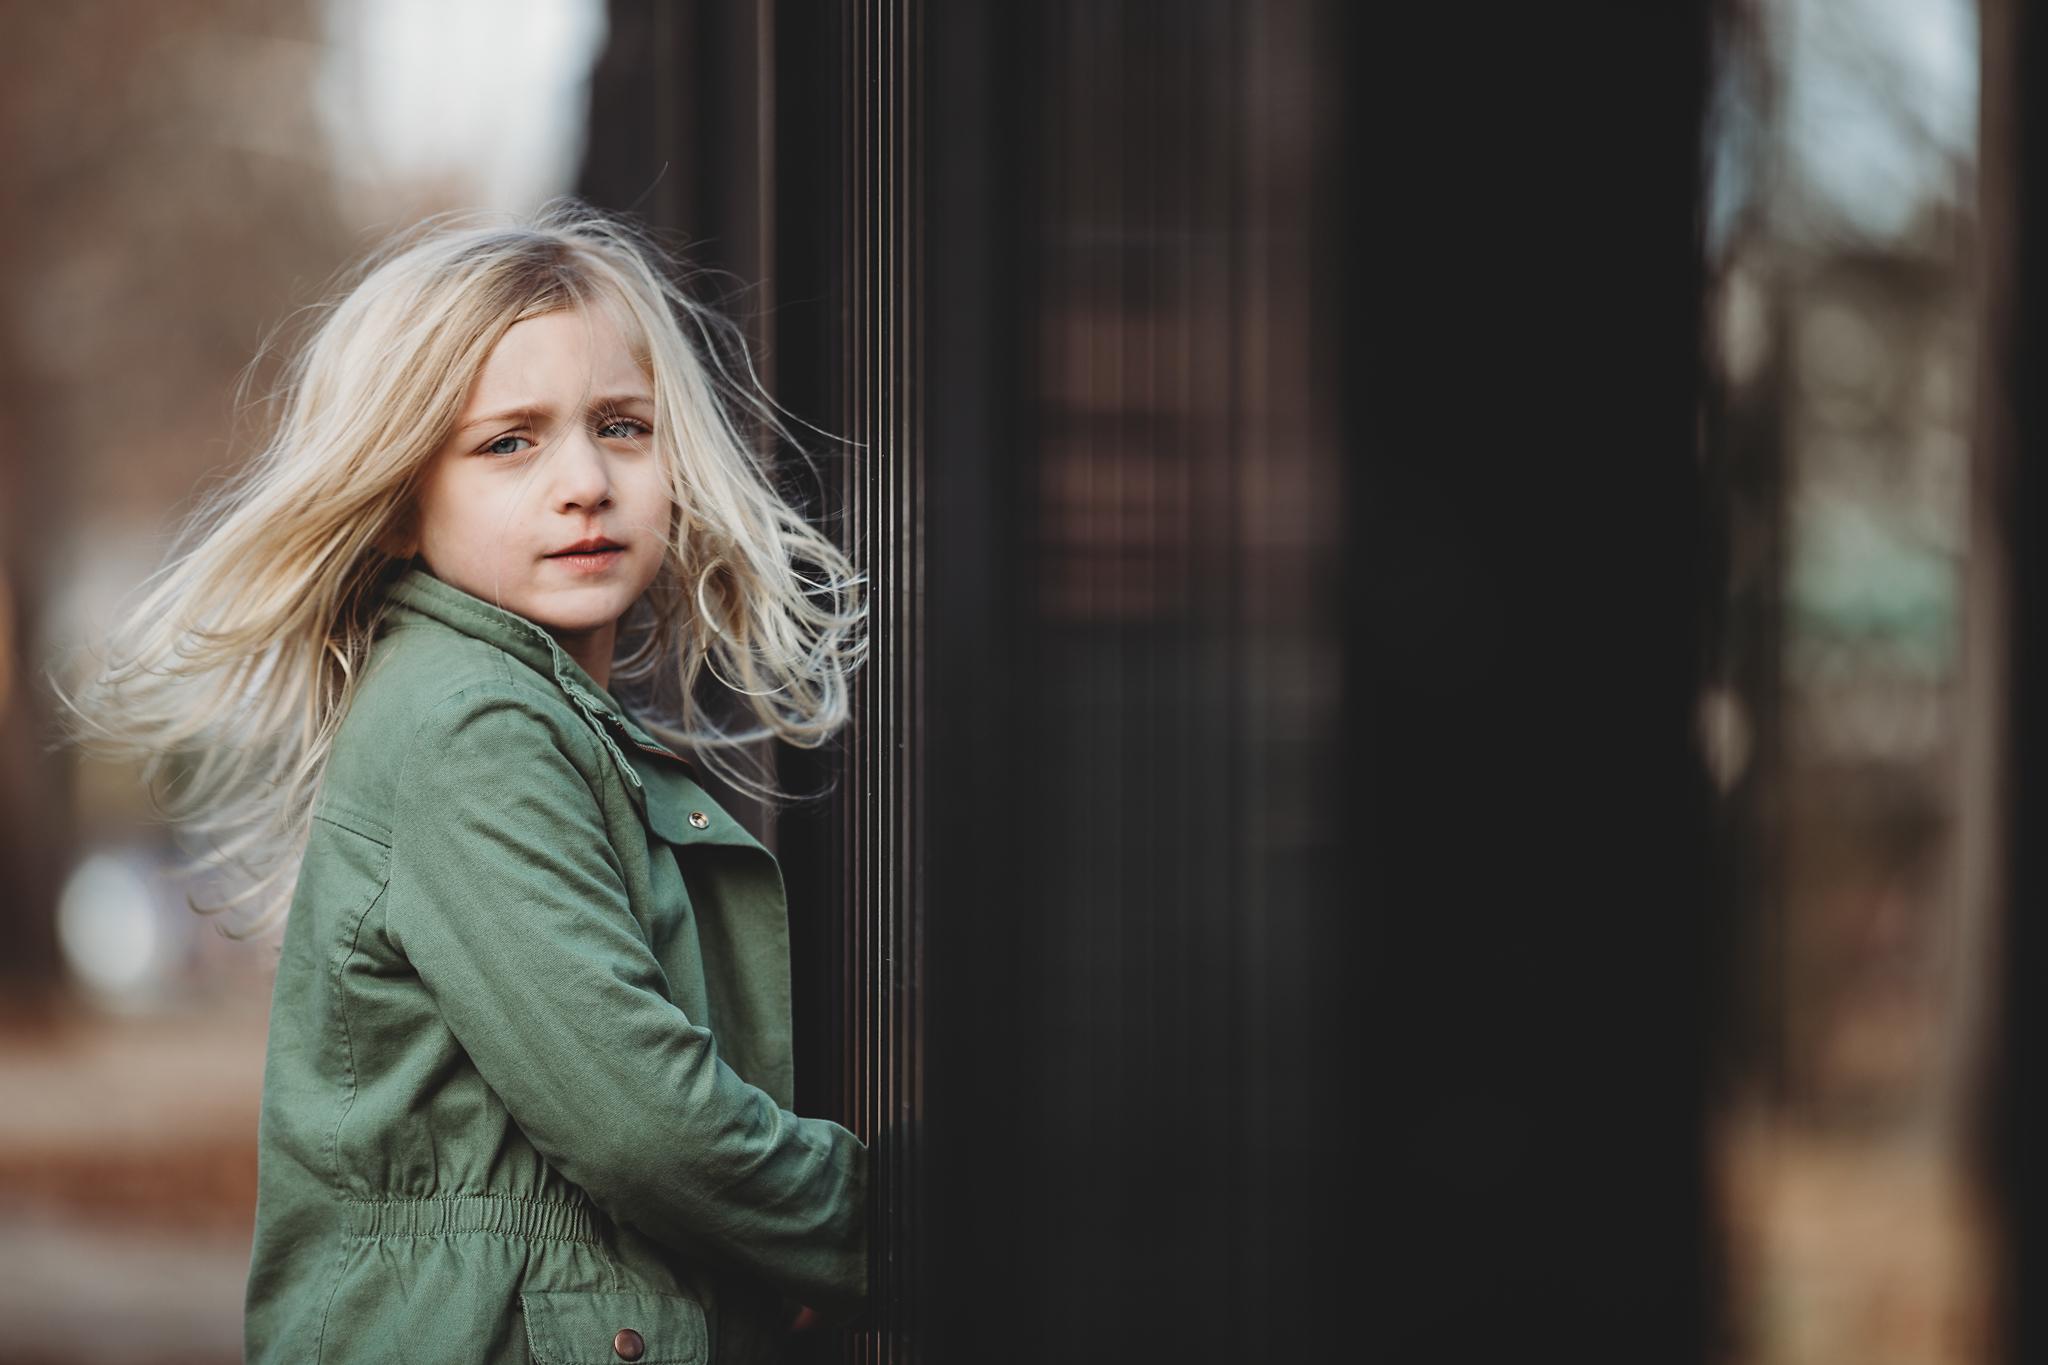 Long-island-photographer-hello-olivia-photography-children-kids-photos-new-york-lifestyle-portraits-suffolk-County-LI-10.jpg